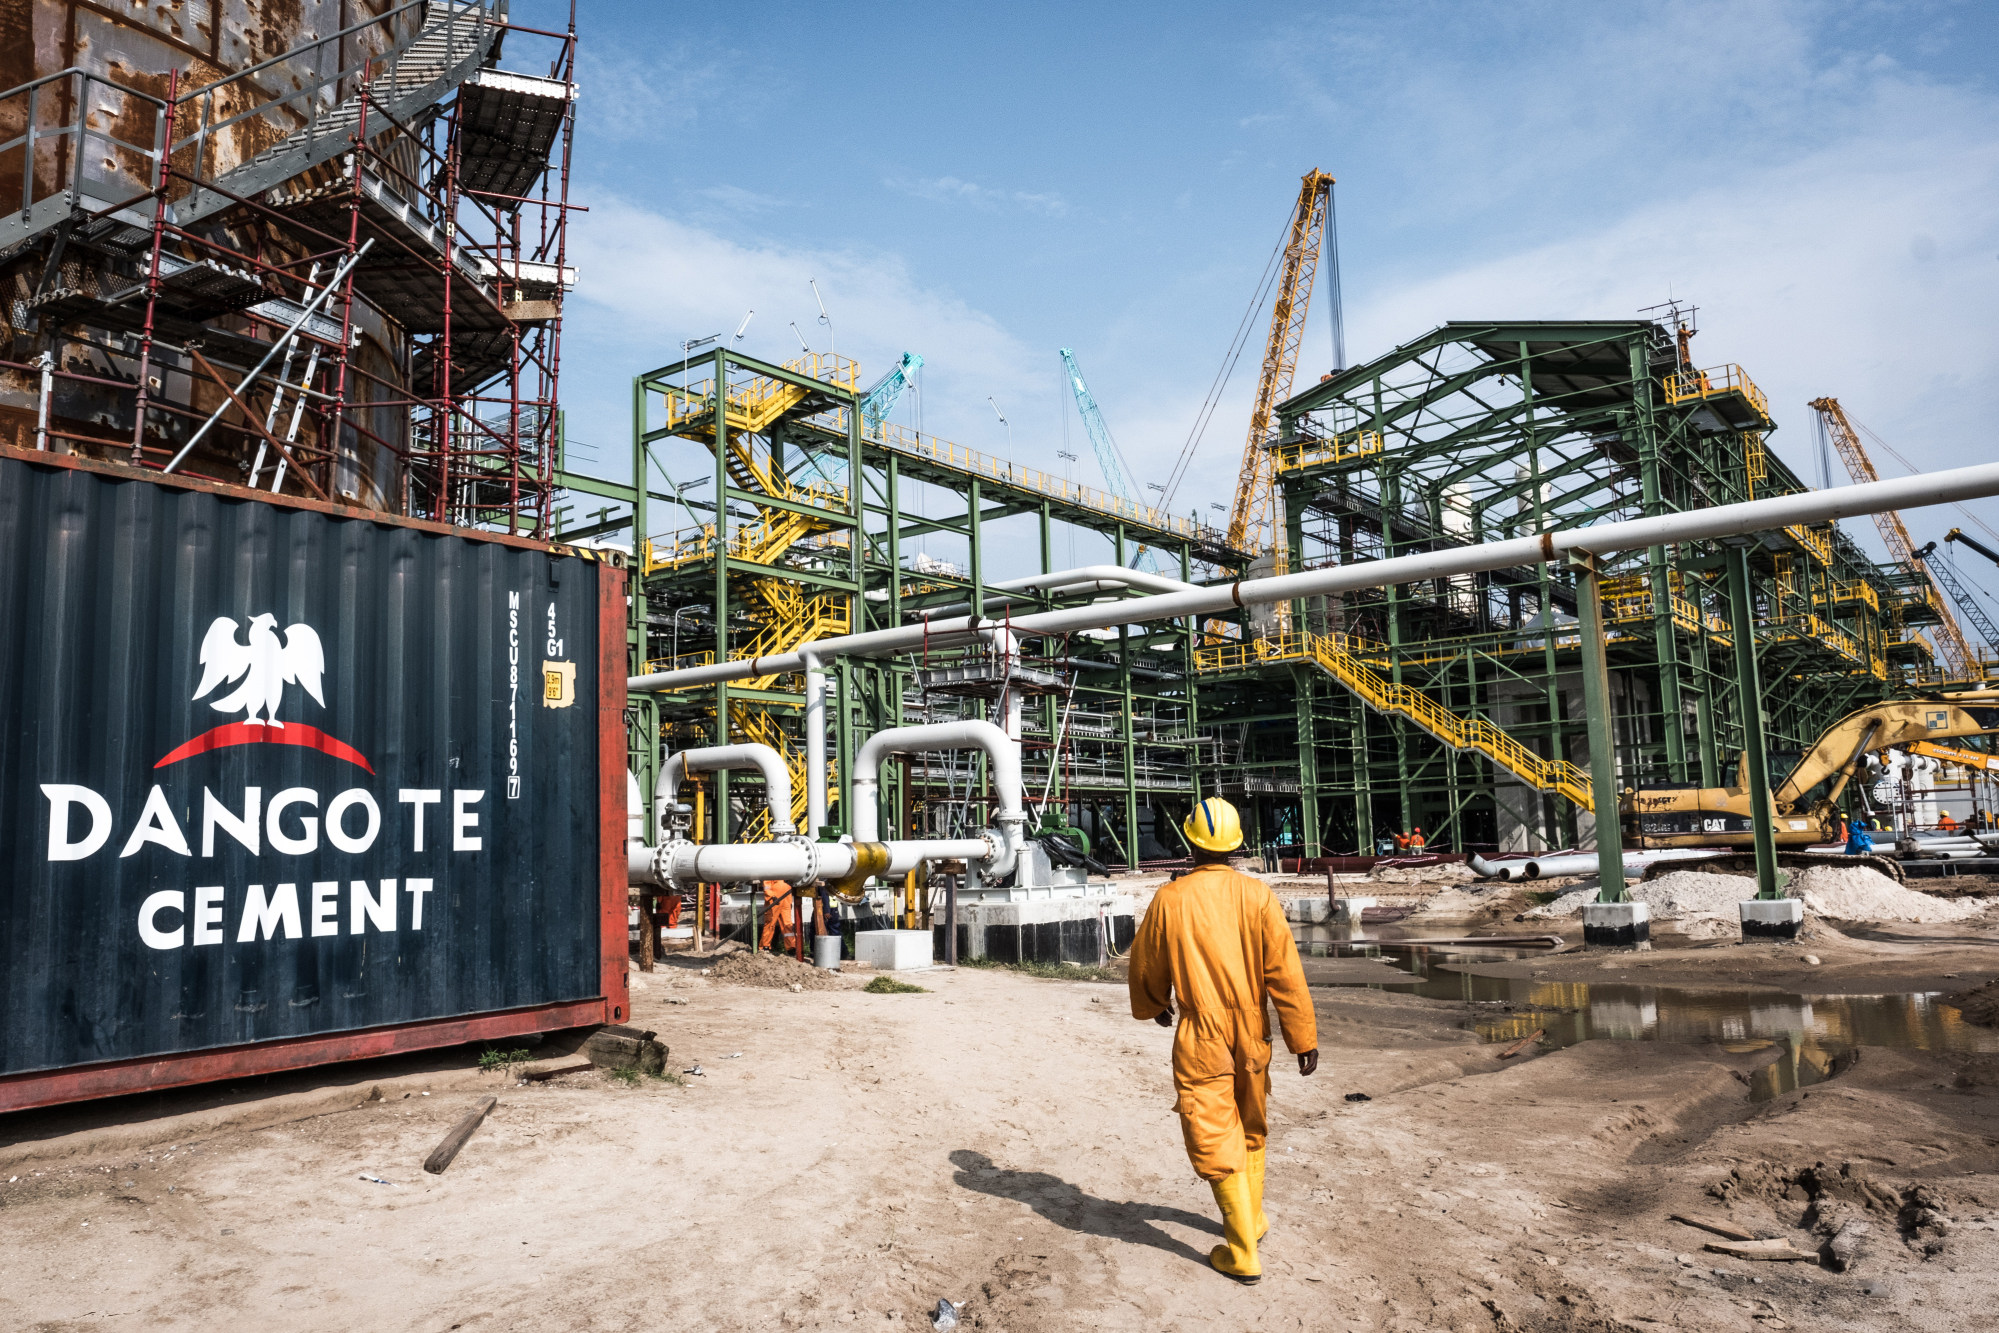 Africa's Richest Man: Dangote's $2 Billion Fertilizer Plant News - Bloomberg